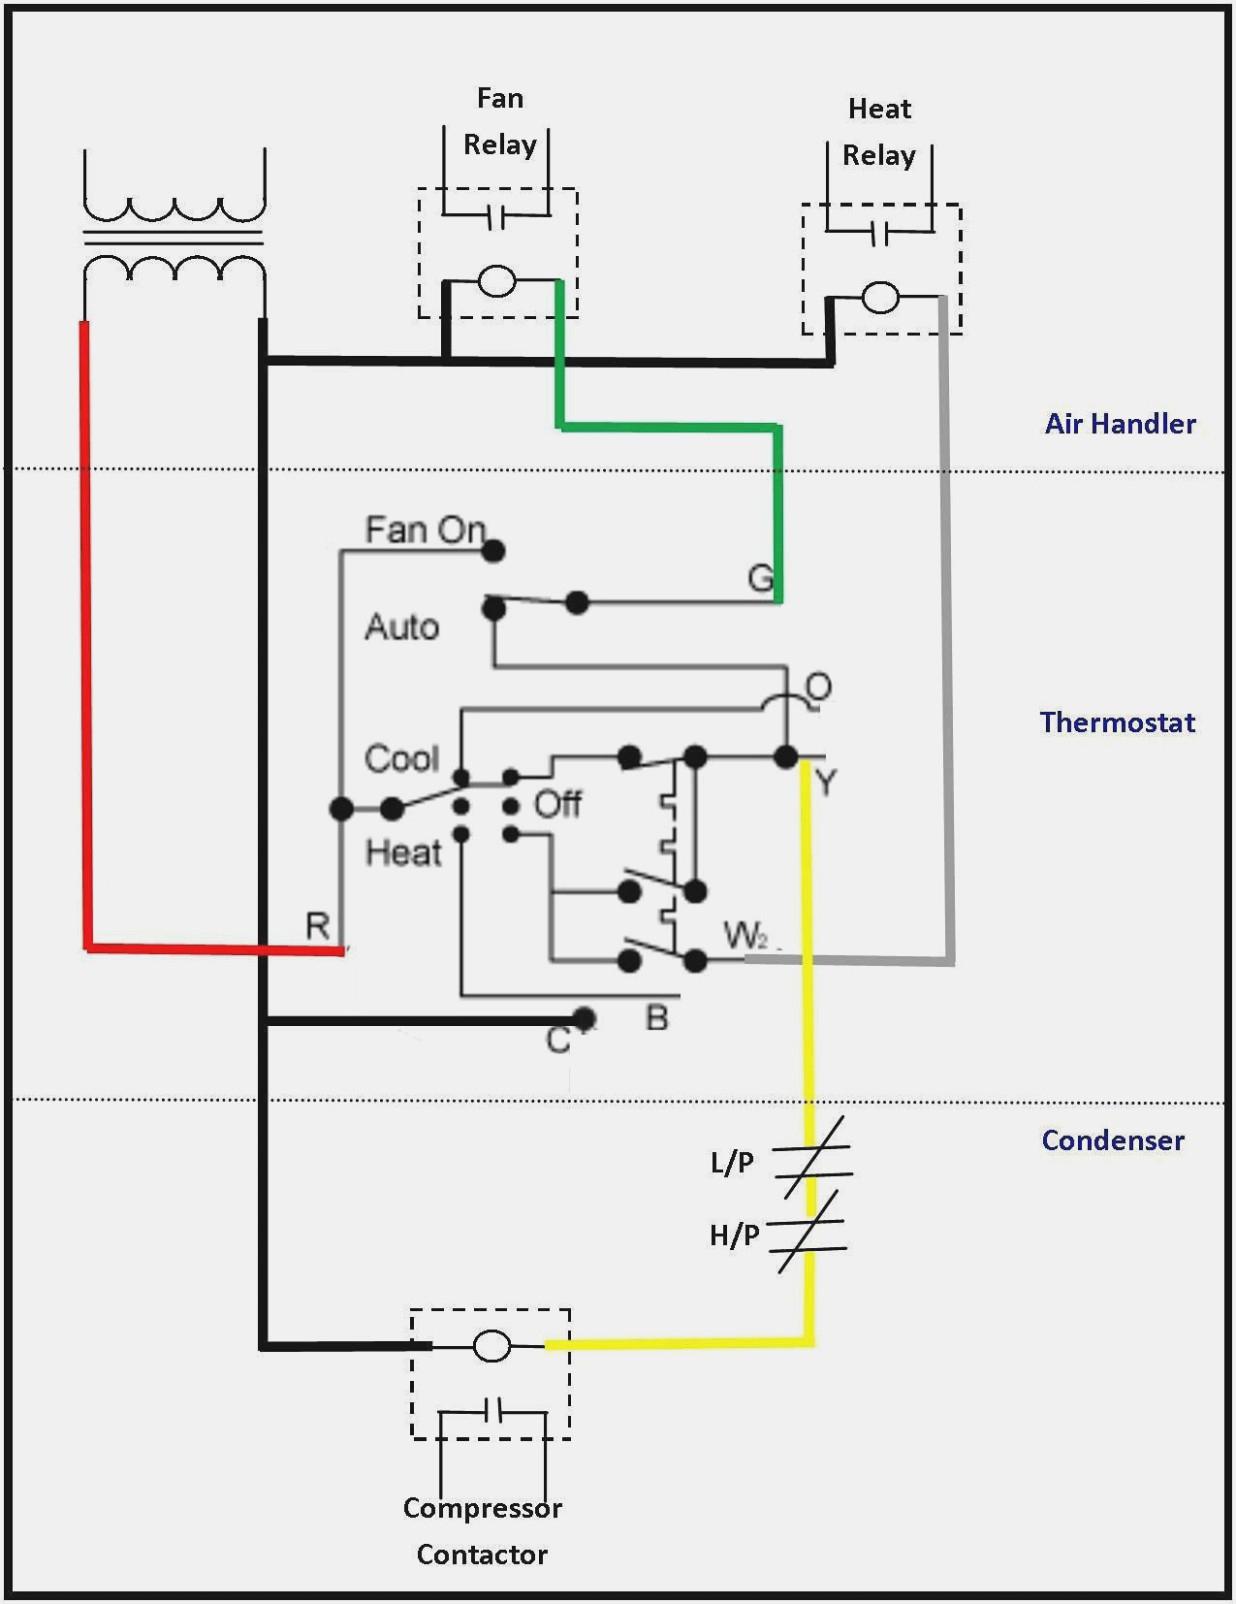 Lincoln Oil Furnace Wiring Diagram - wiring diagram series-action -  series-action.teglieromane.itTeglie Romane